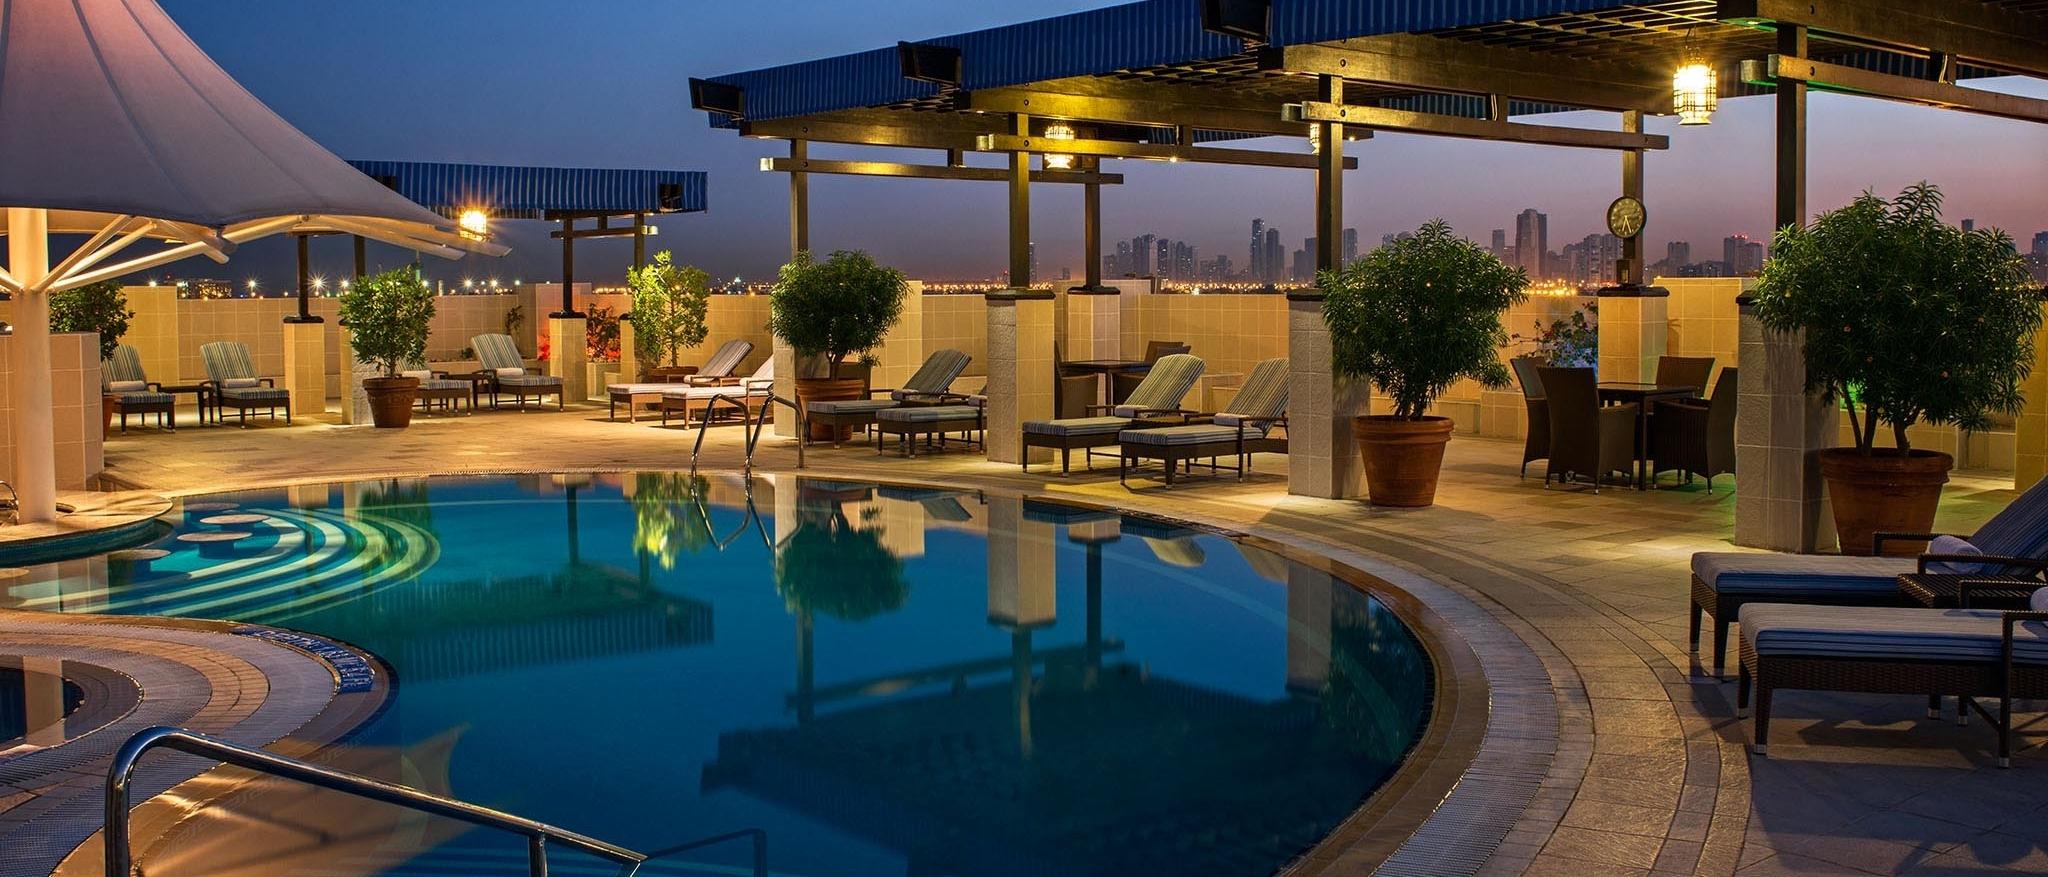 Grand Excelsior Hotel Deira Formerly Sheraton Deira Dubai Venue Eventopedia